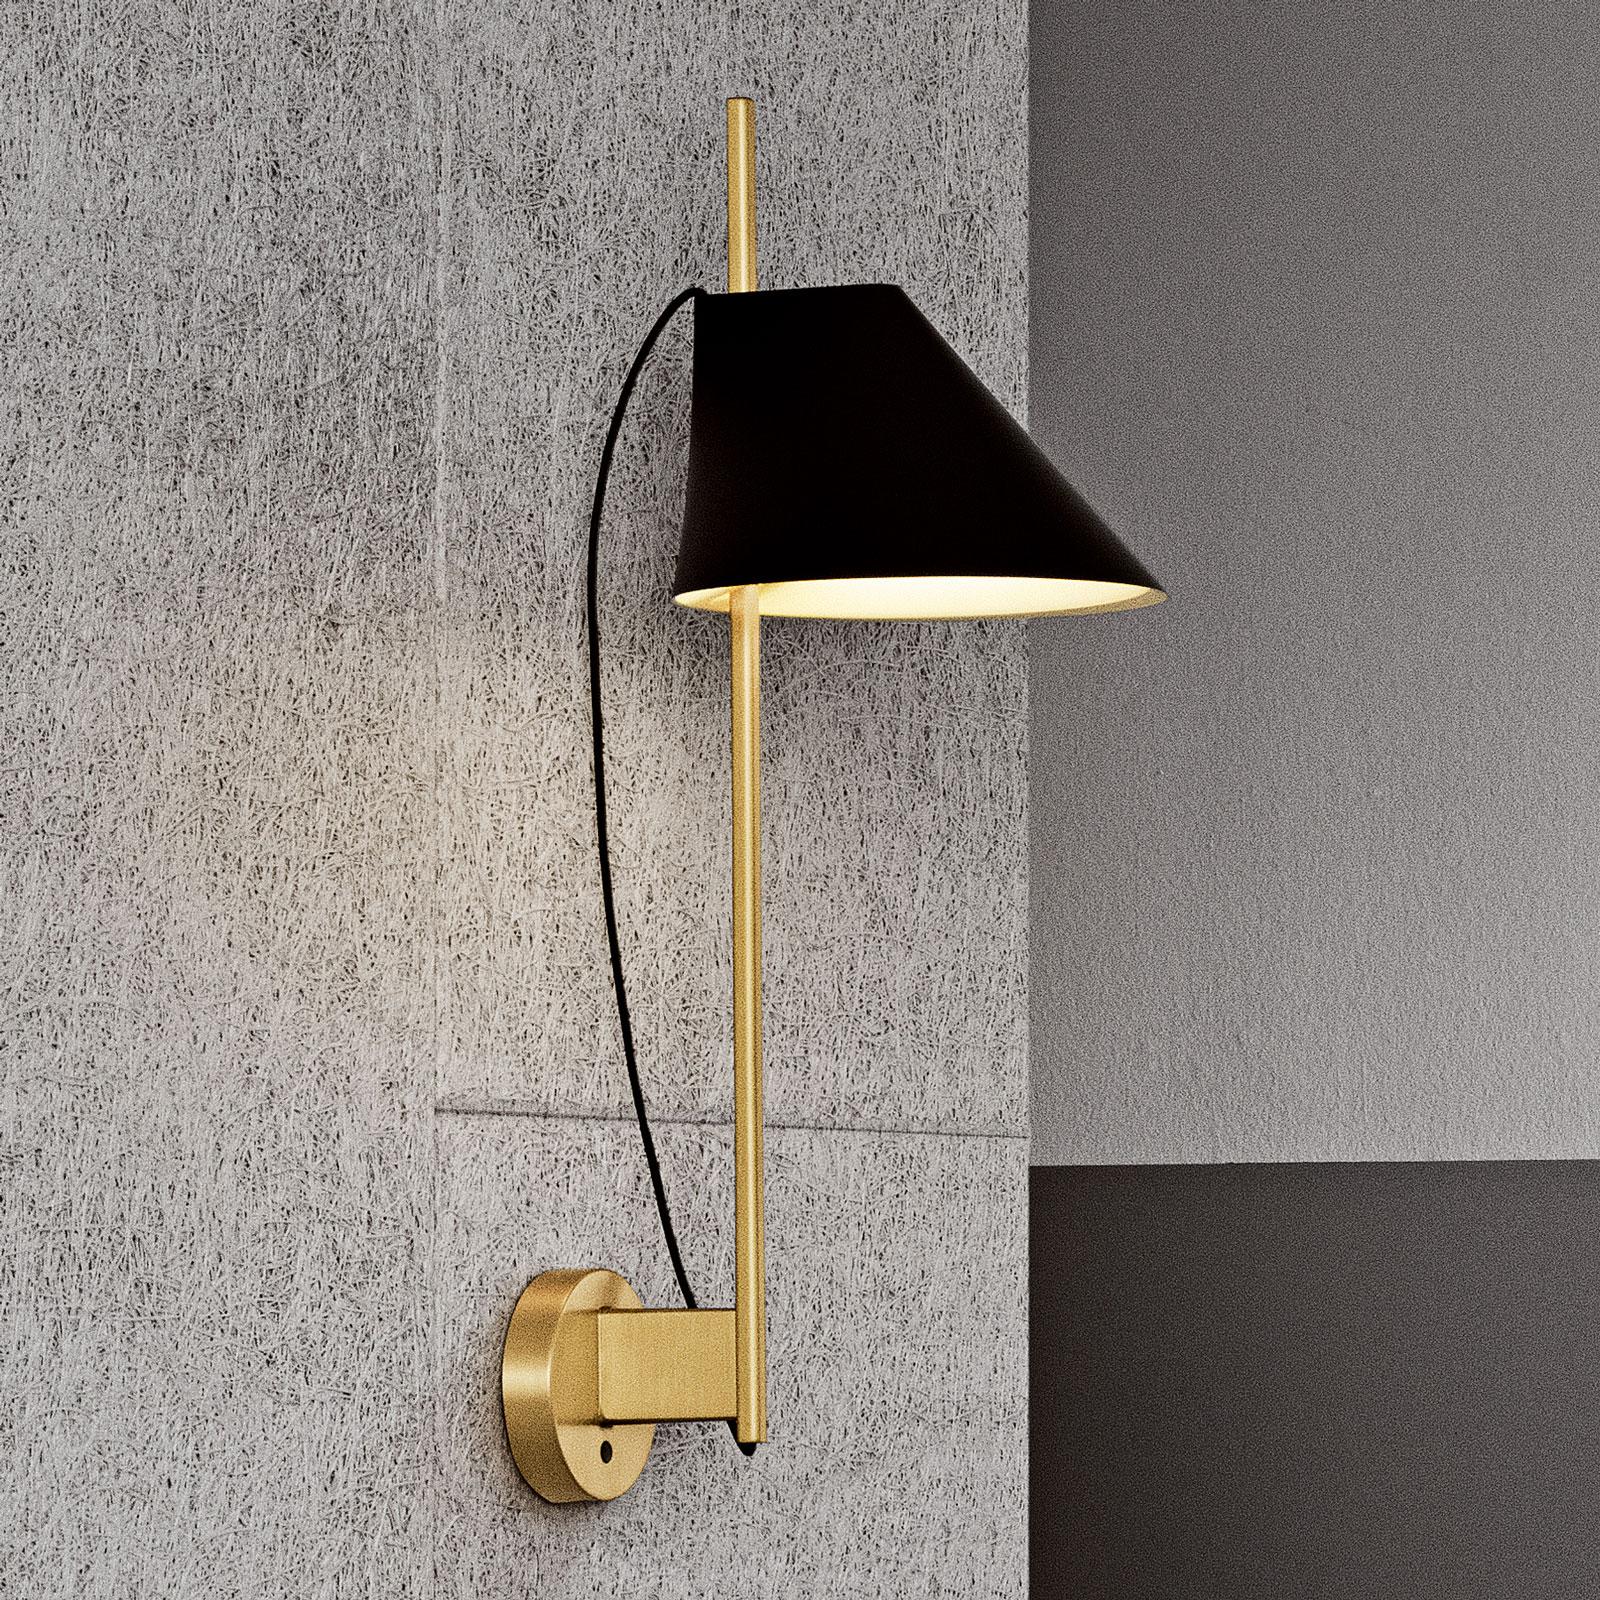 Louis Poulsen Marmor-Wandlampe Yuh Brass, schwarz